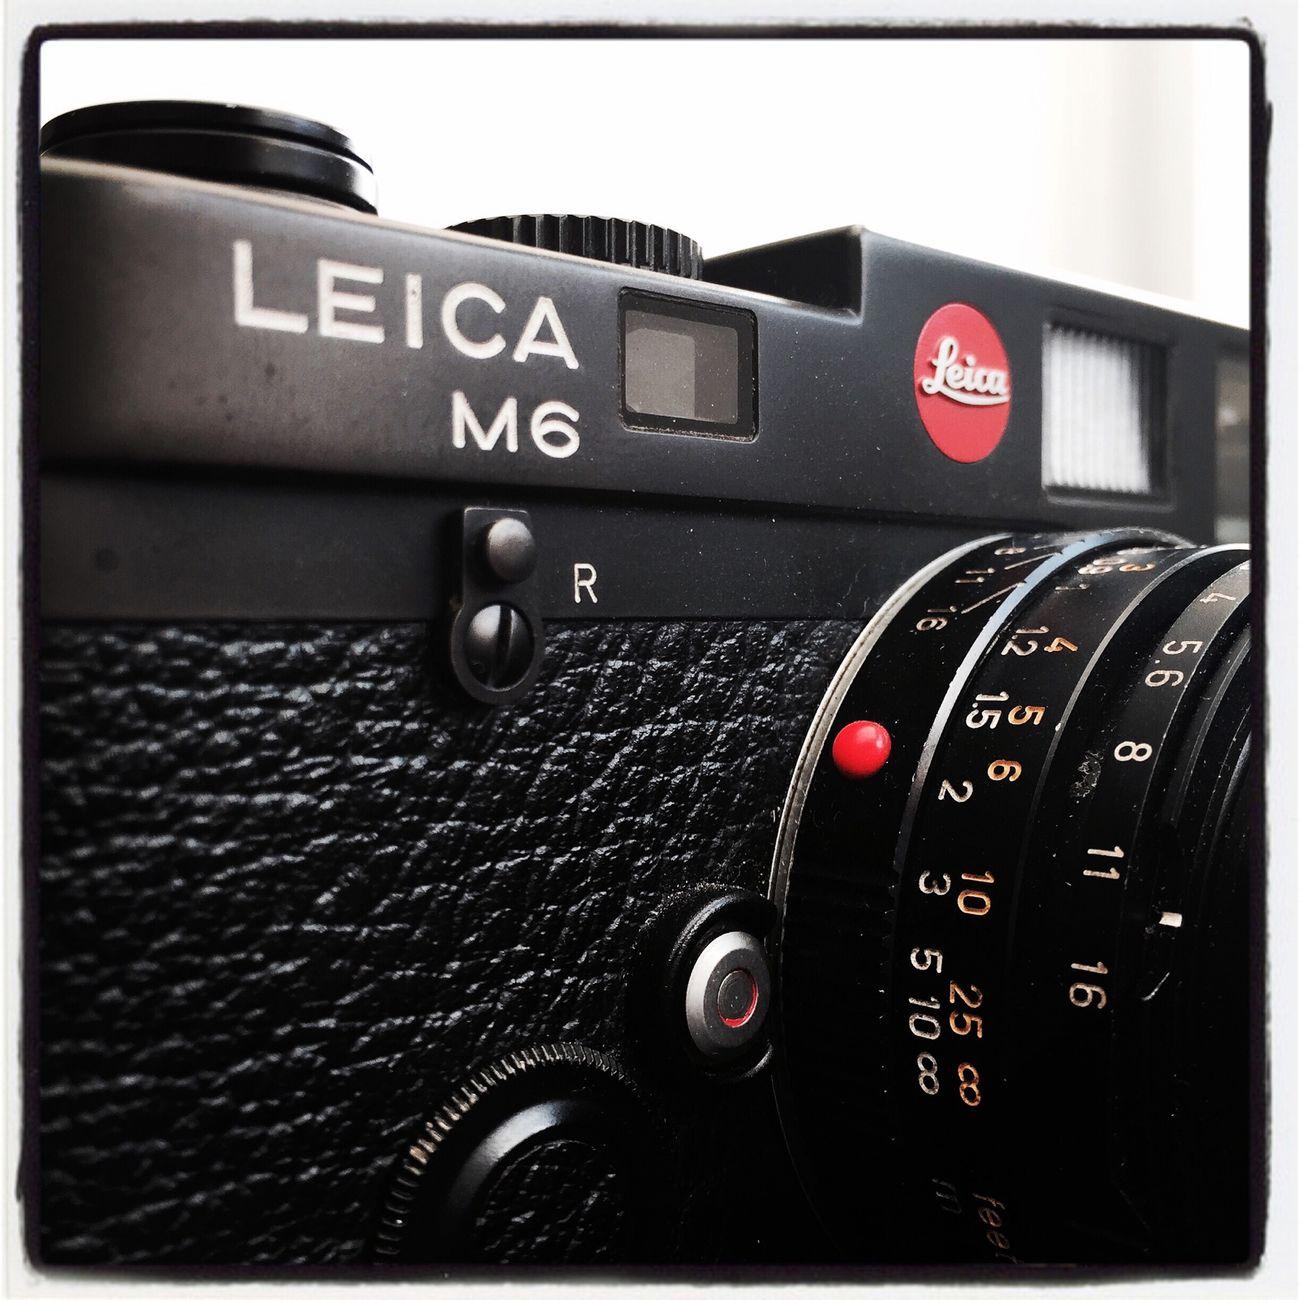 Leica iphone6